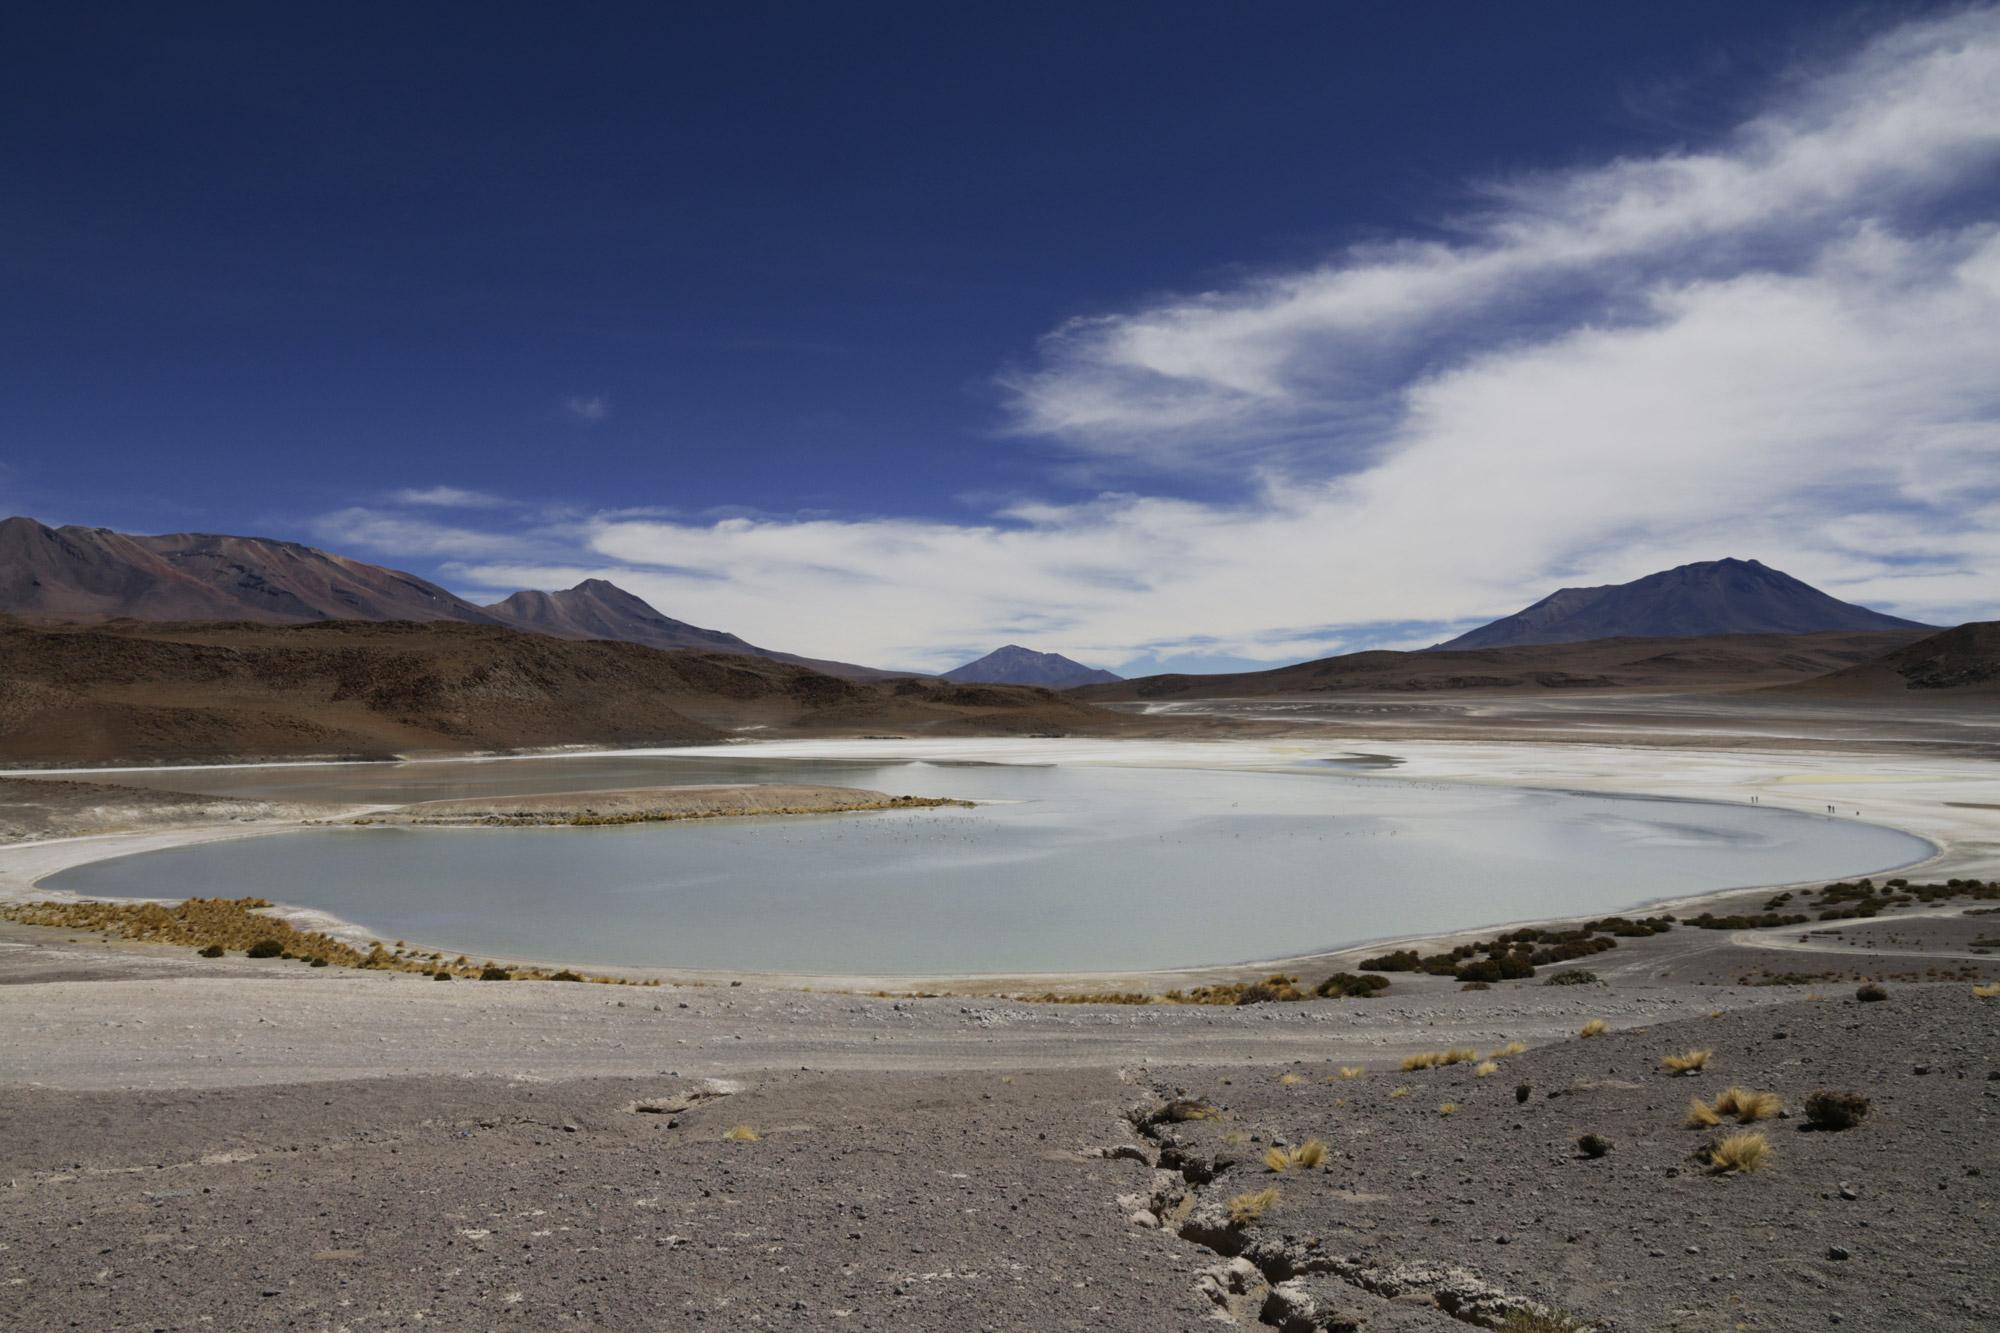 Reisverslag Bolivia: 's wereld grootste zoutvlakte - Laguna Honda